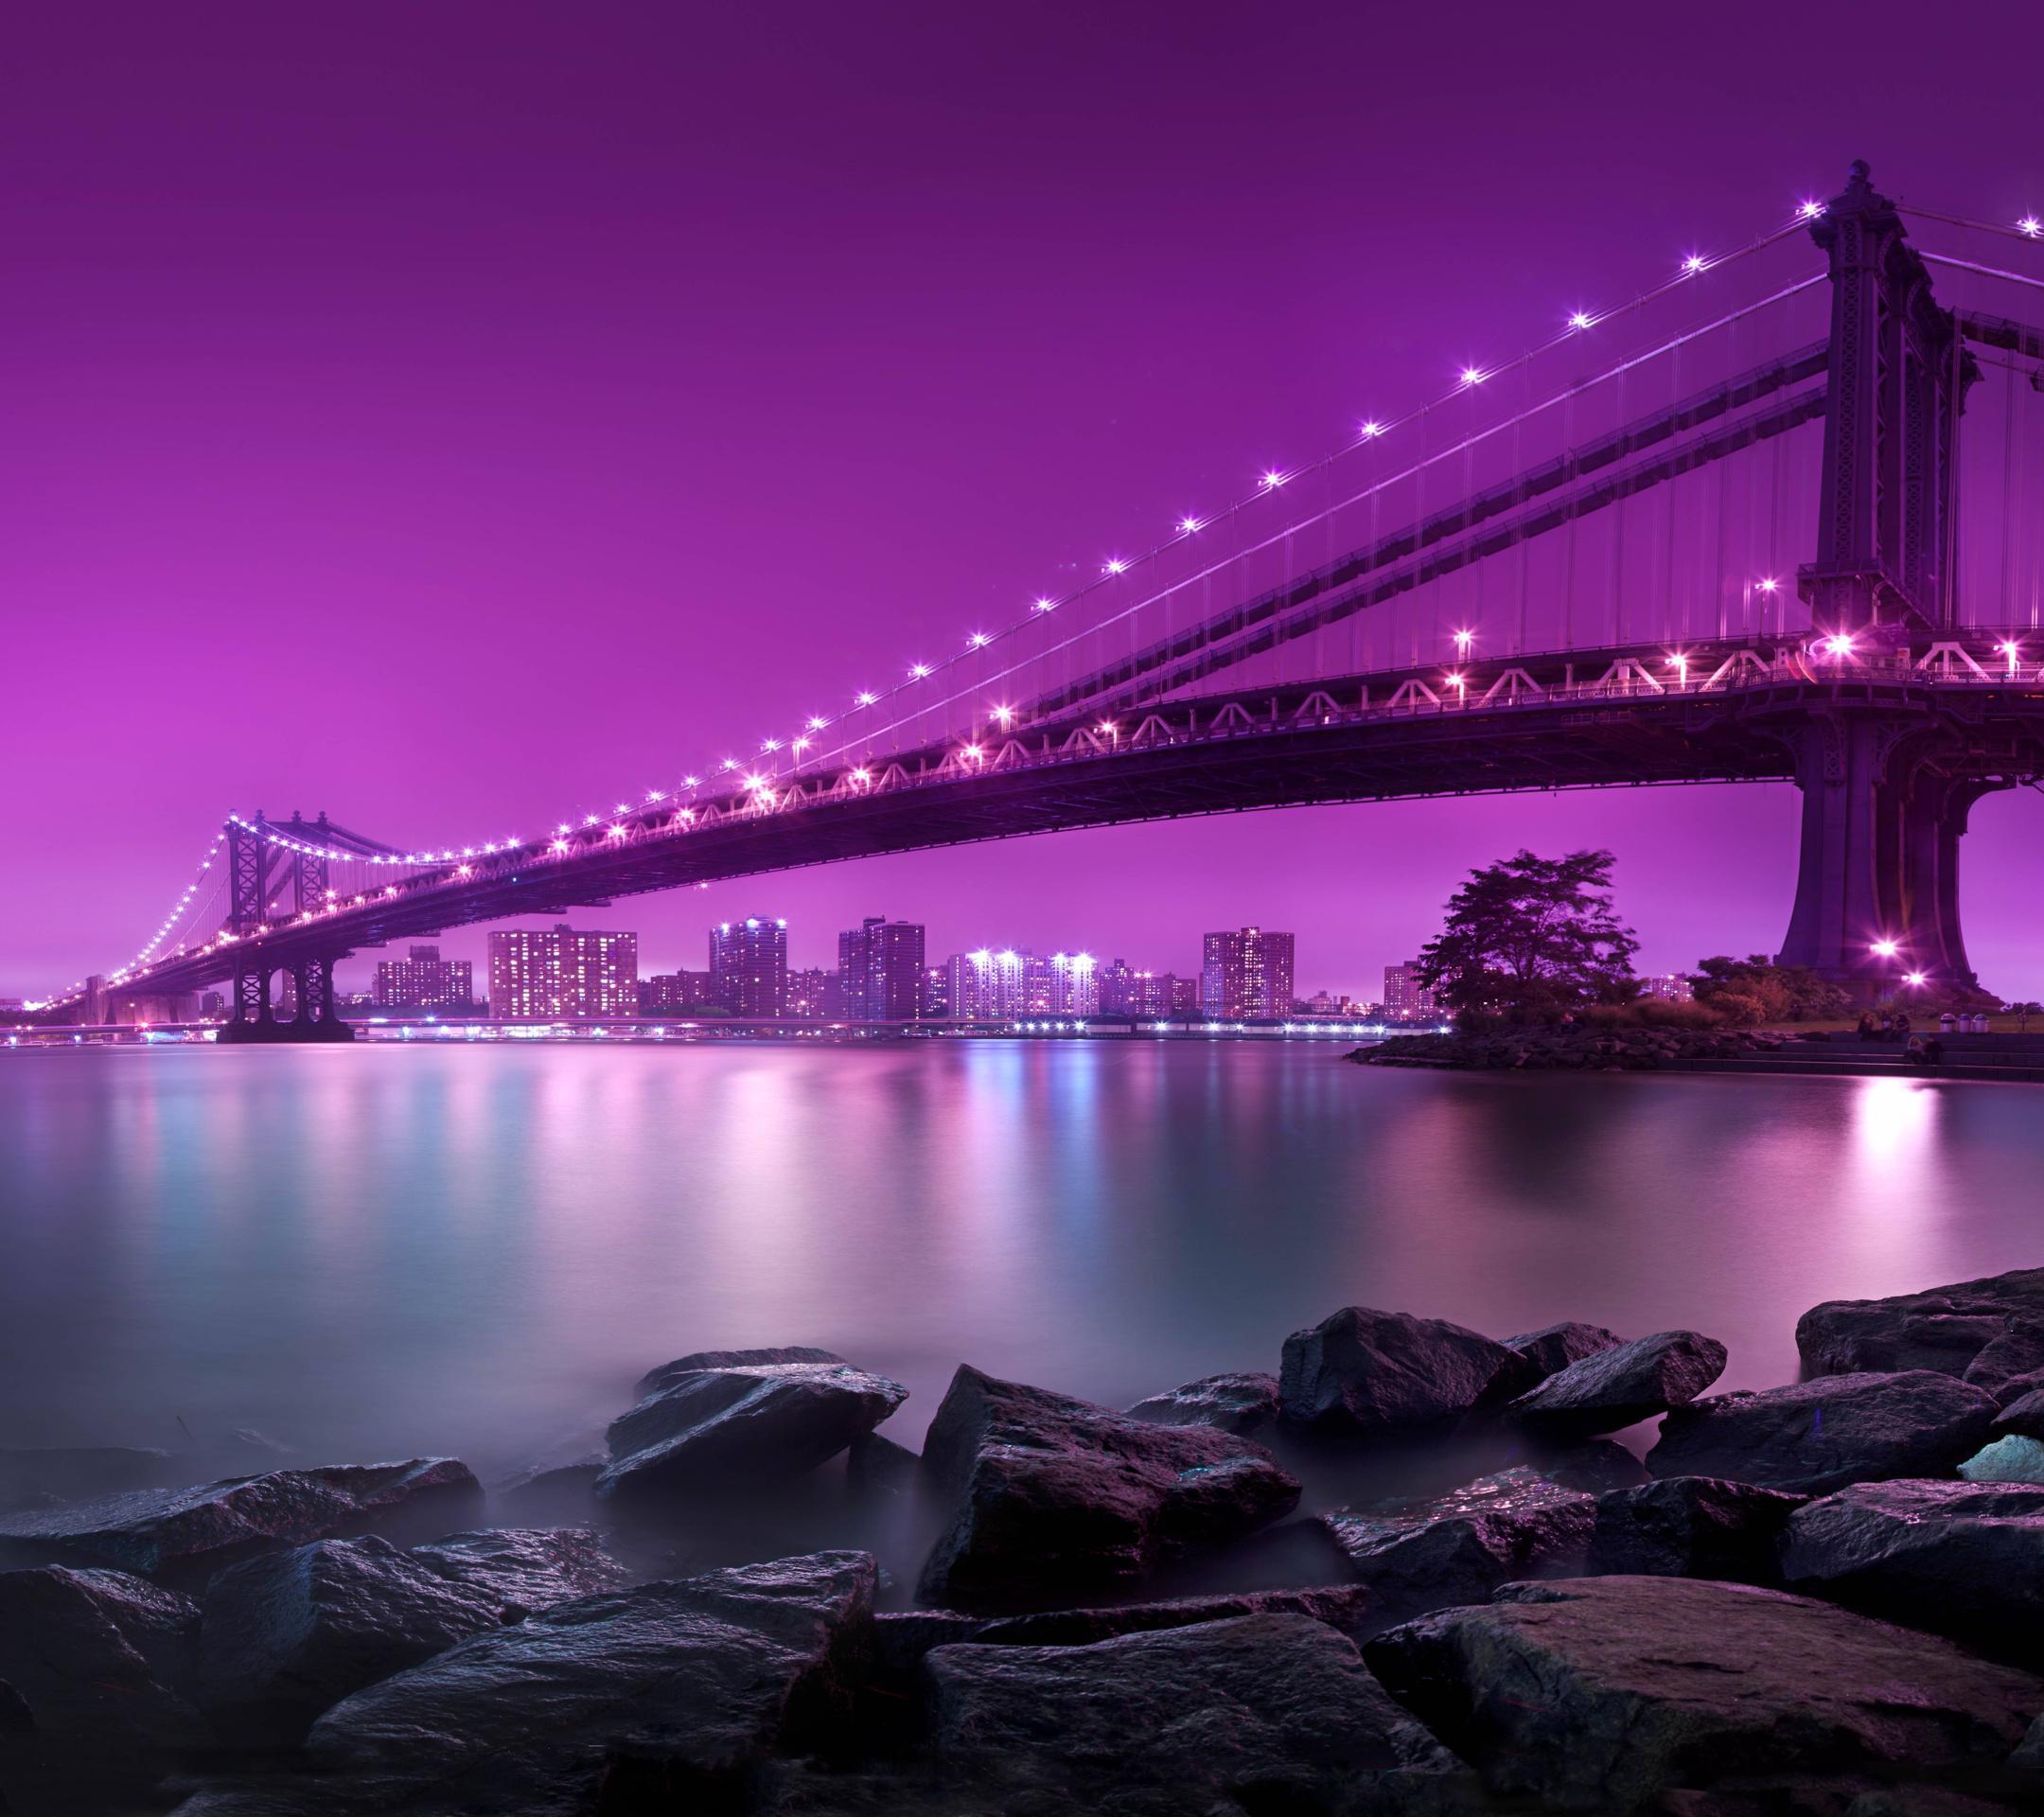 Free bridge.jpg phone wallpaper by tribeca